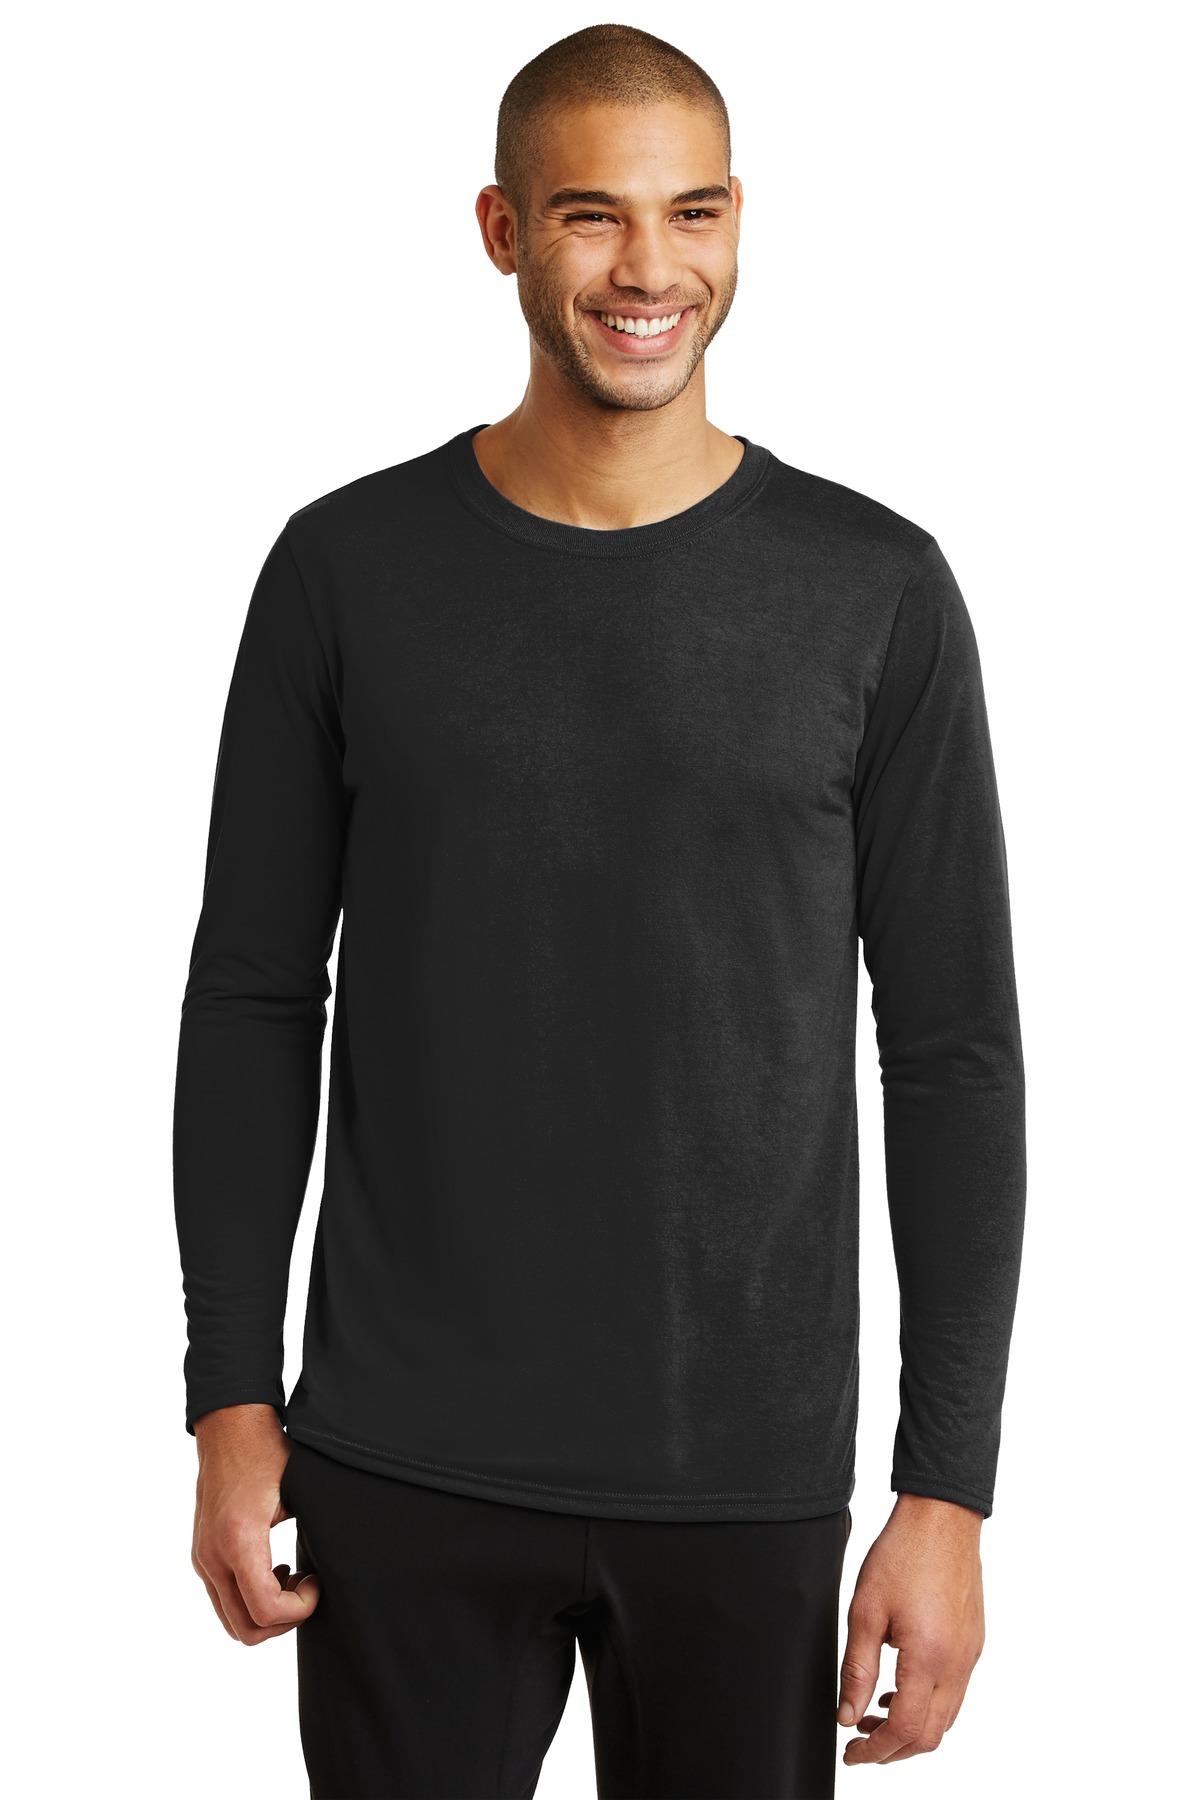 Gildan Performance® Long Sleeve T-Shirt.-Promotional